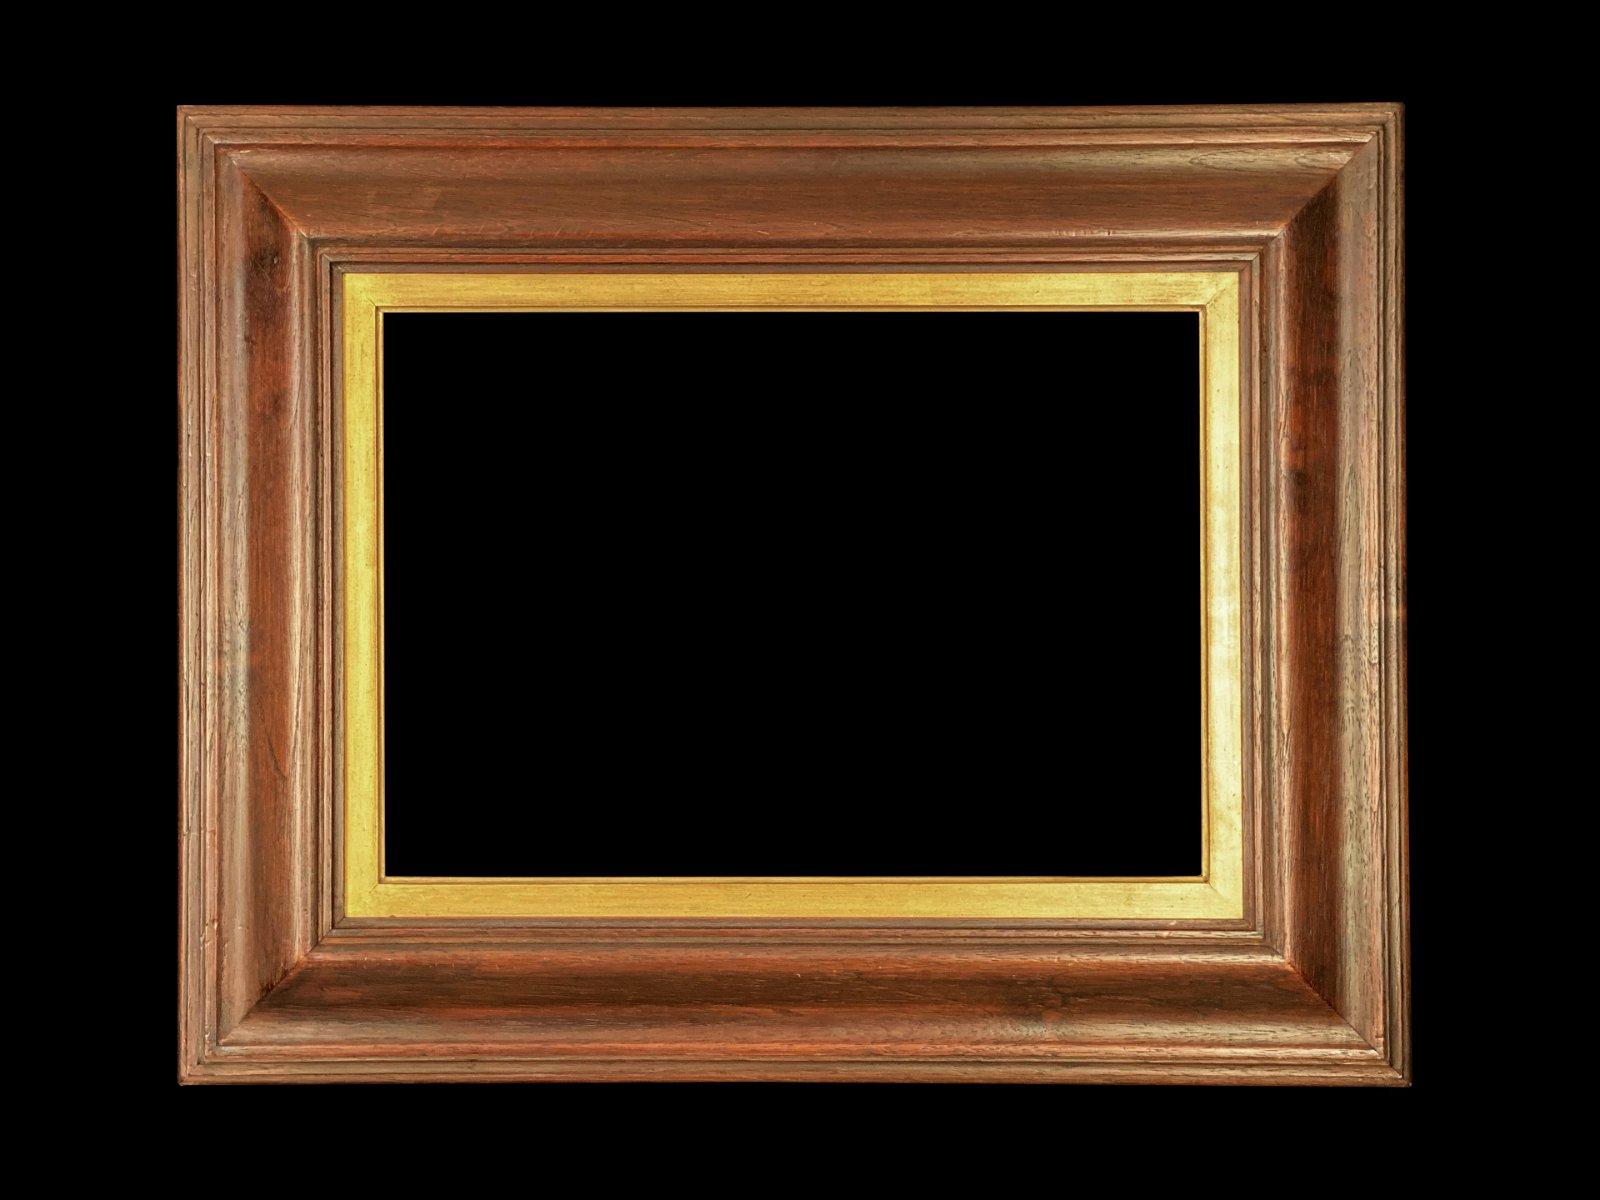 Eli Wilner Frame, Modernist Style, Ex: Cezanne